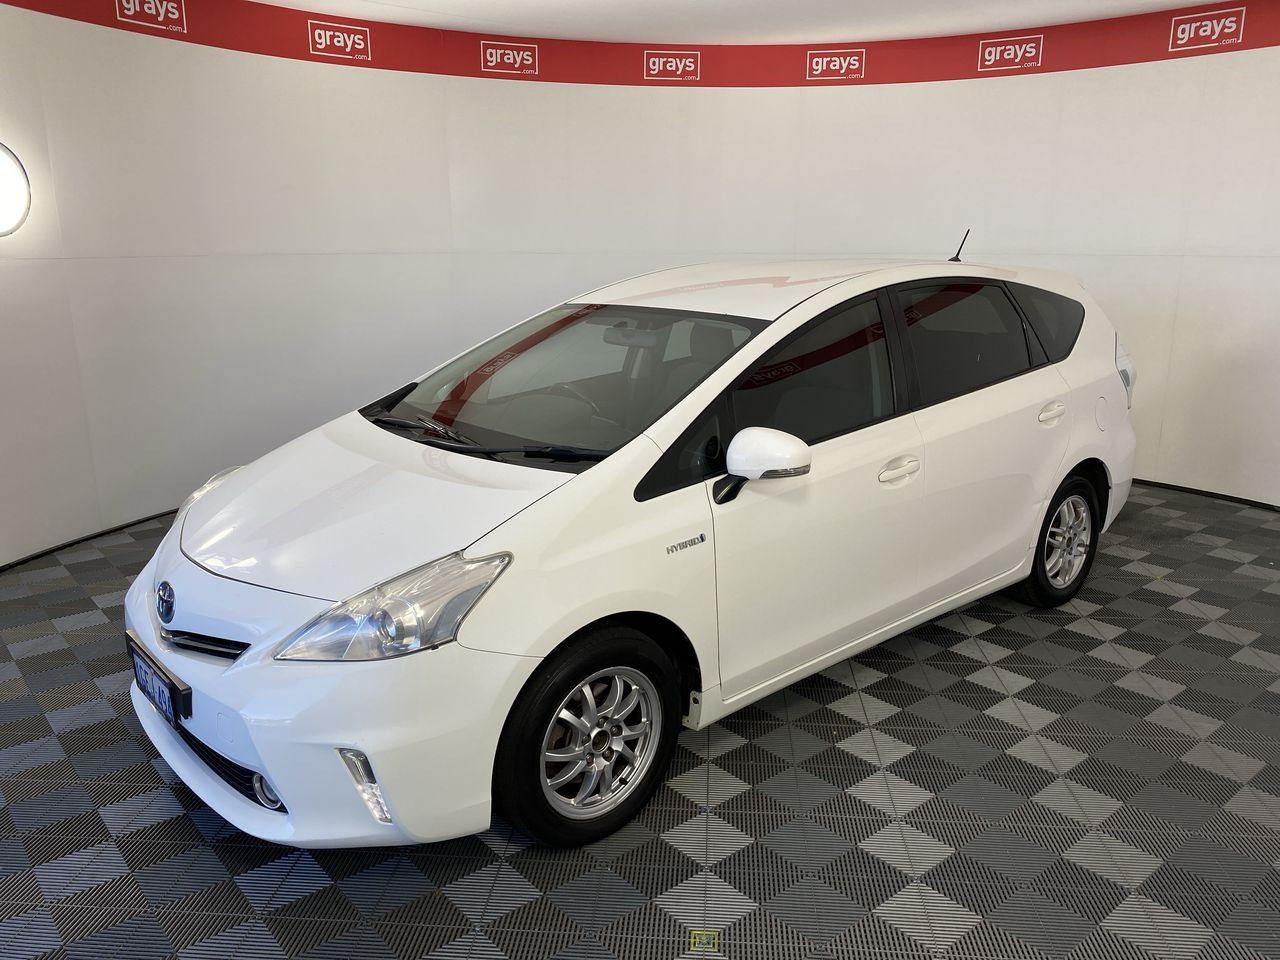 2012 Toyota PRIUS-V ZVW40R Automatic 7 Seats Wagon